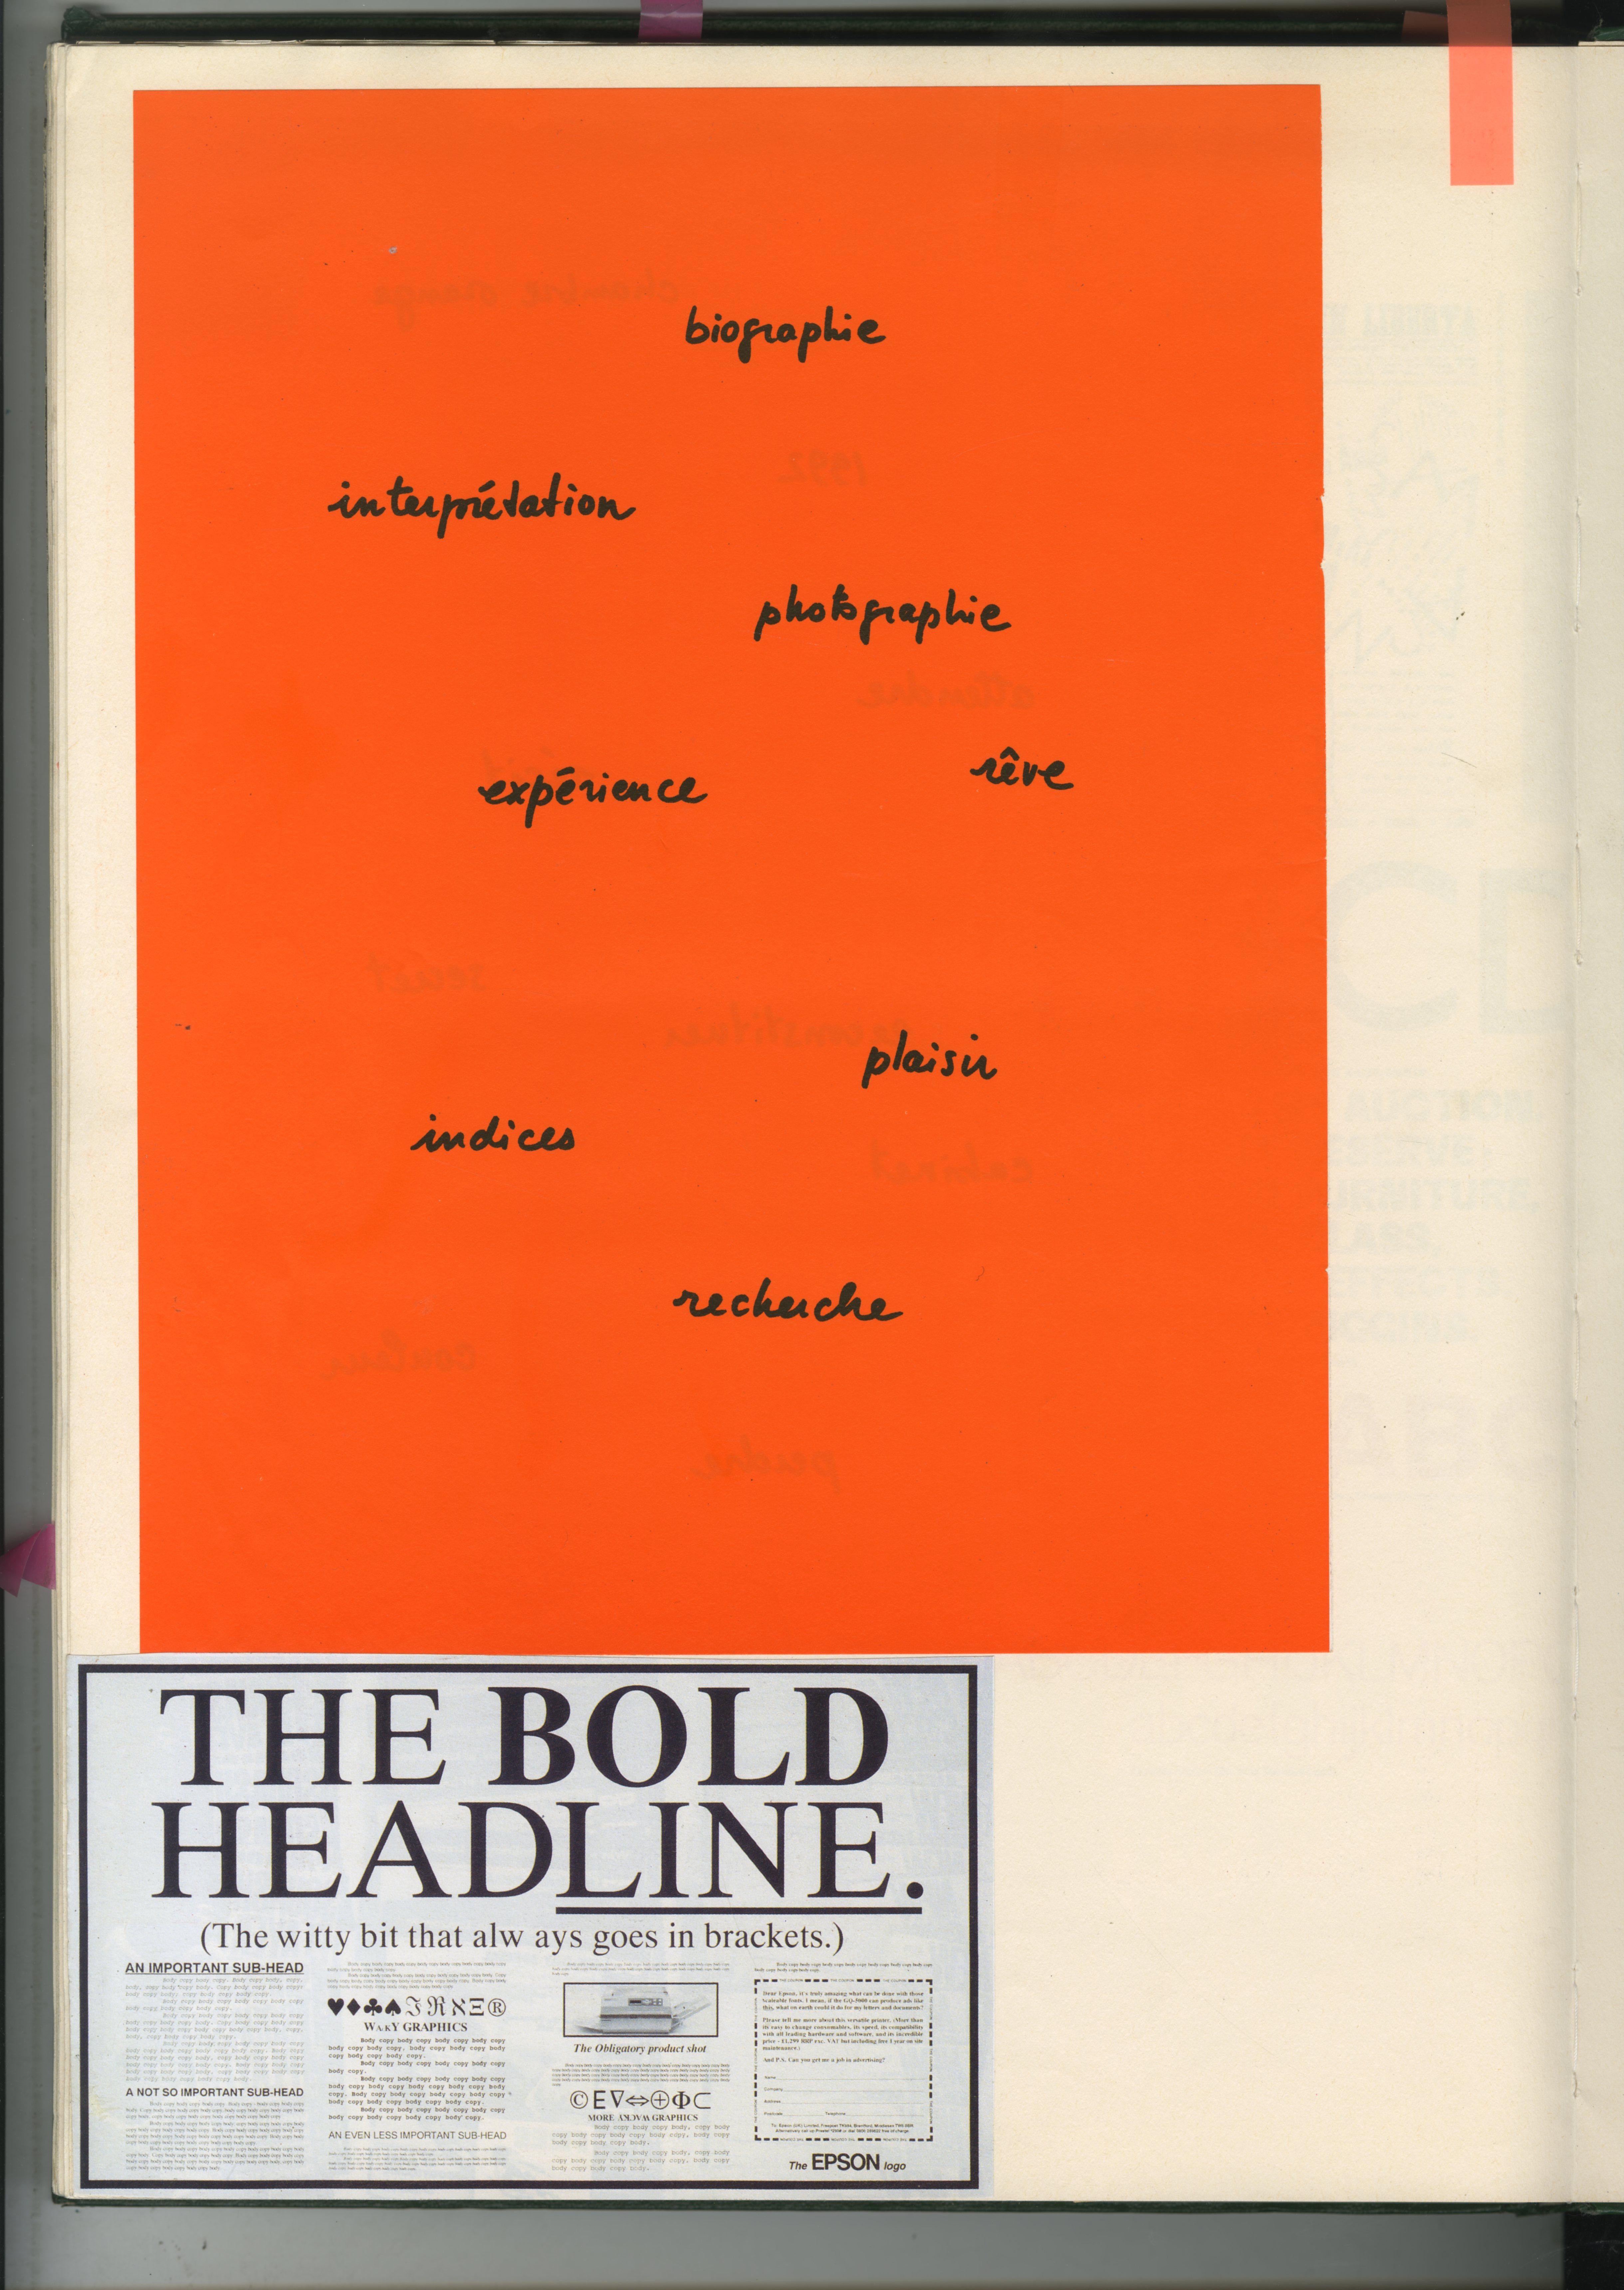 86. GREEN BOOKS: 'Type'